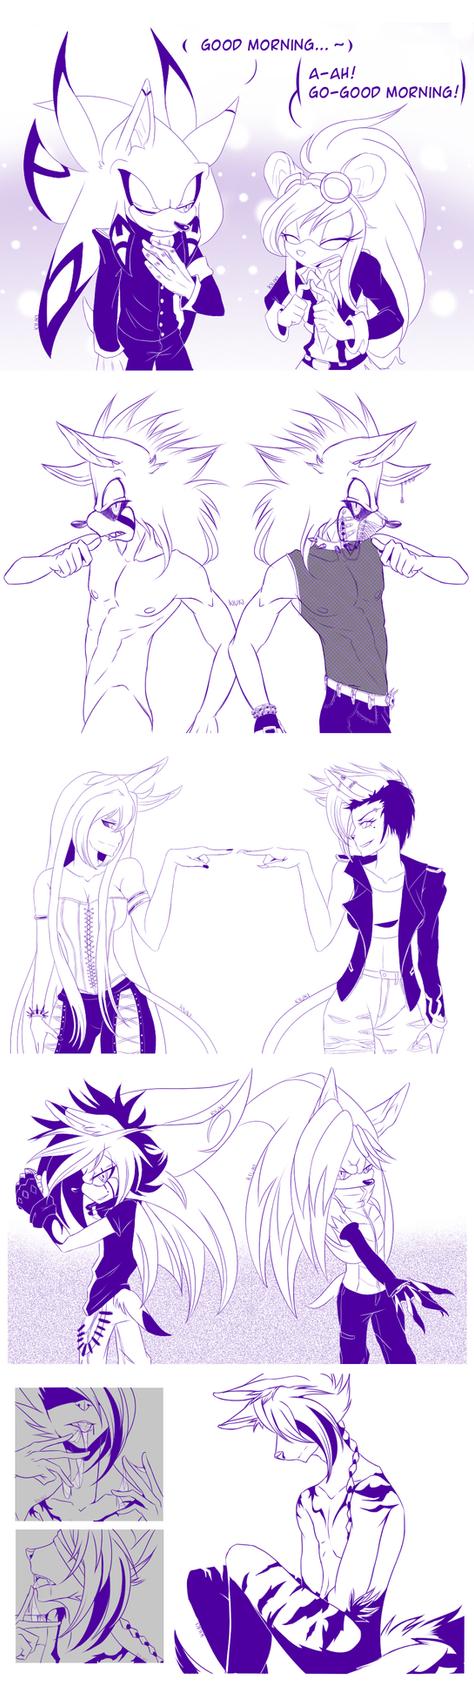 Doodle Dark Linearts by kiuki-10